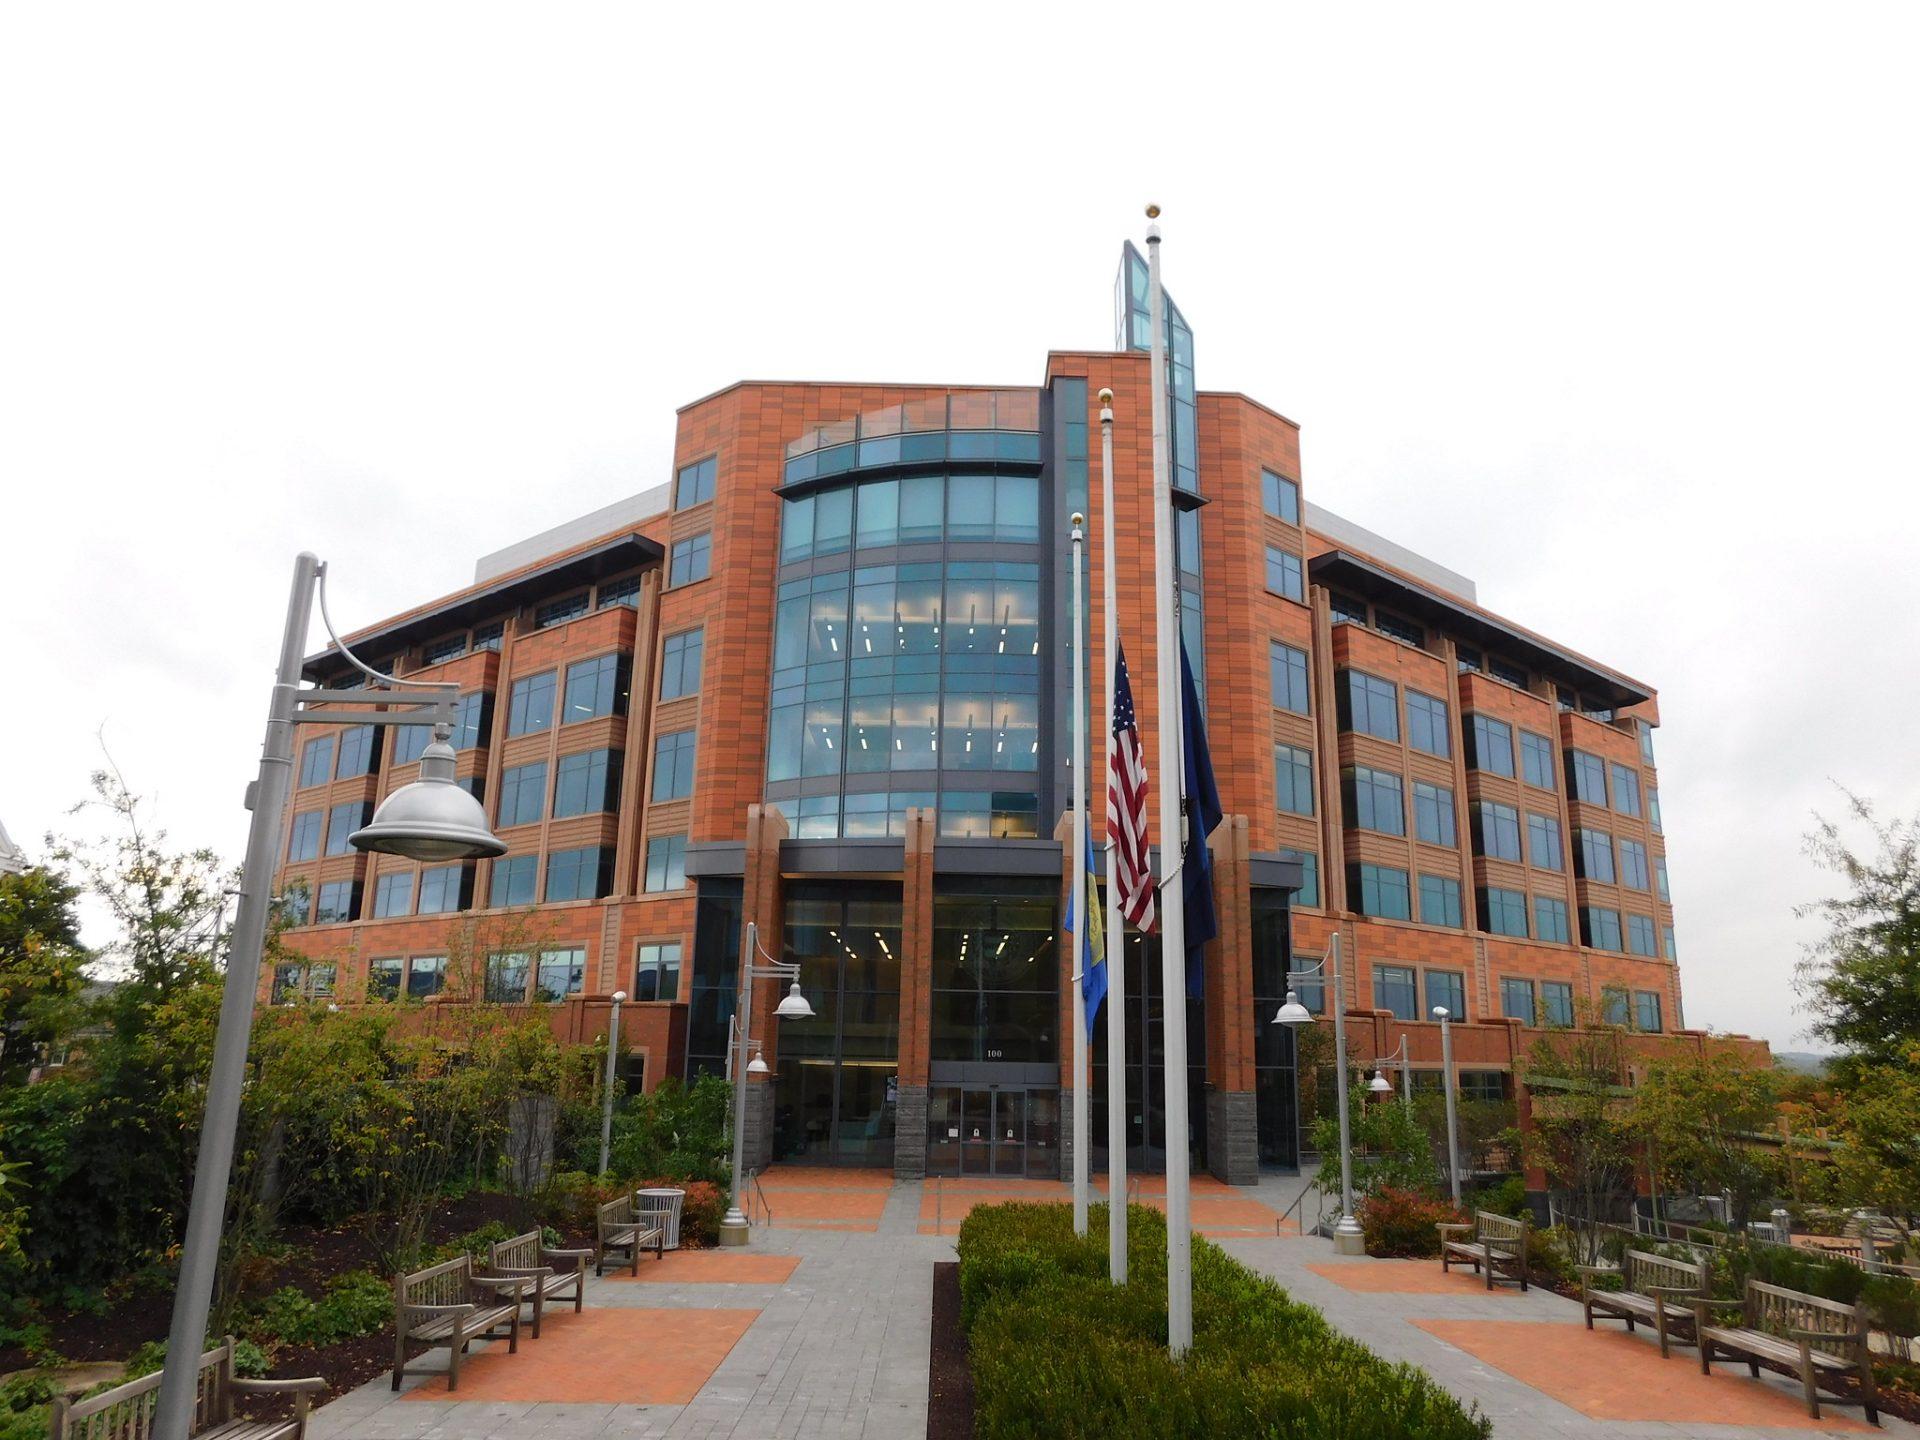 Bucks County Justice Center